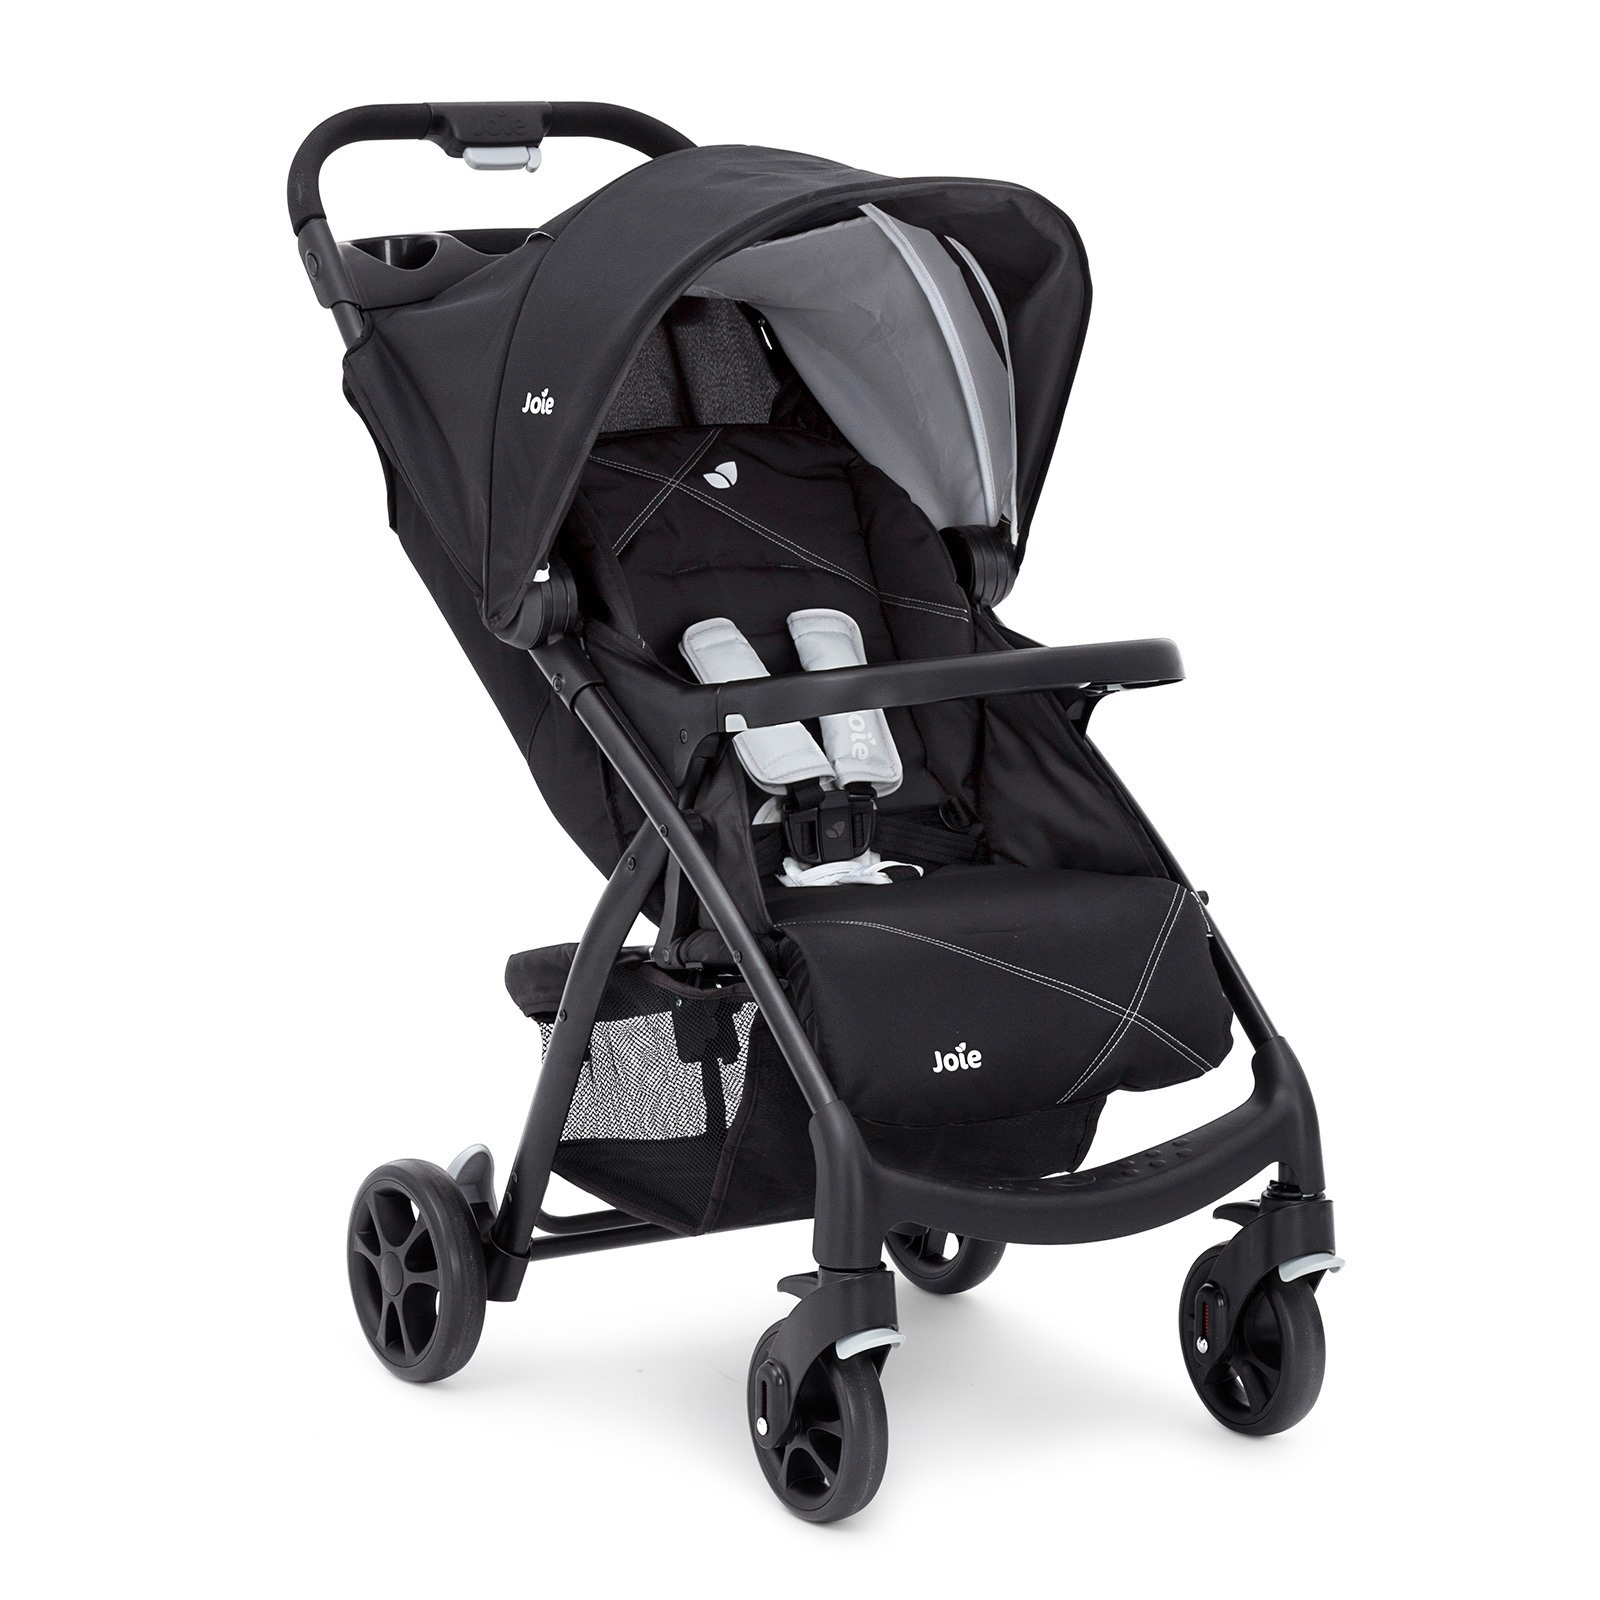 Joie Muze Lx Travel System Baby Stroller 2019